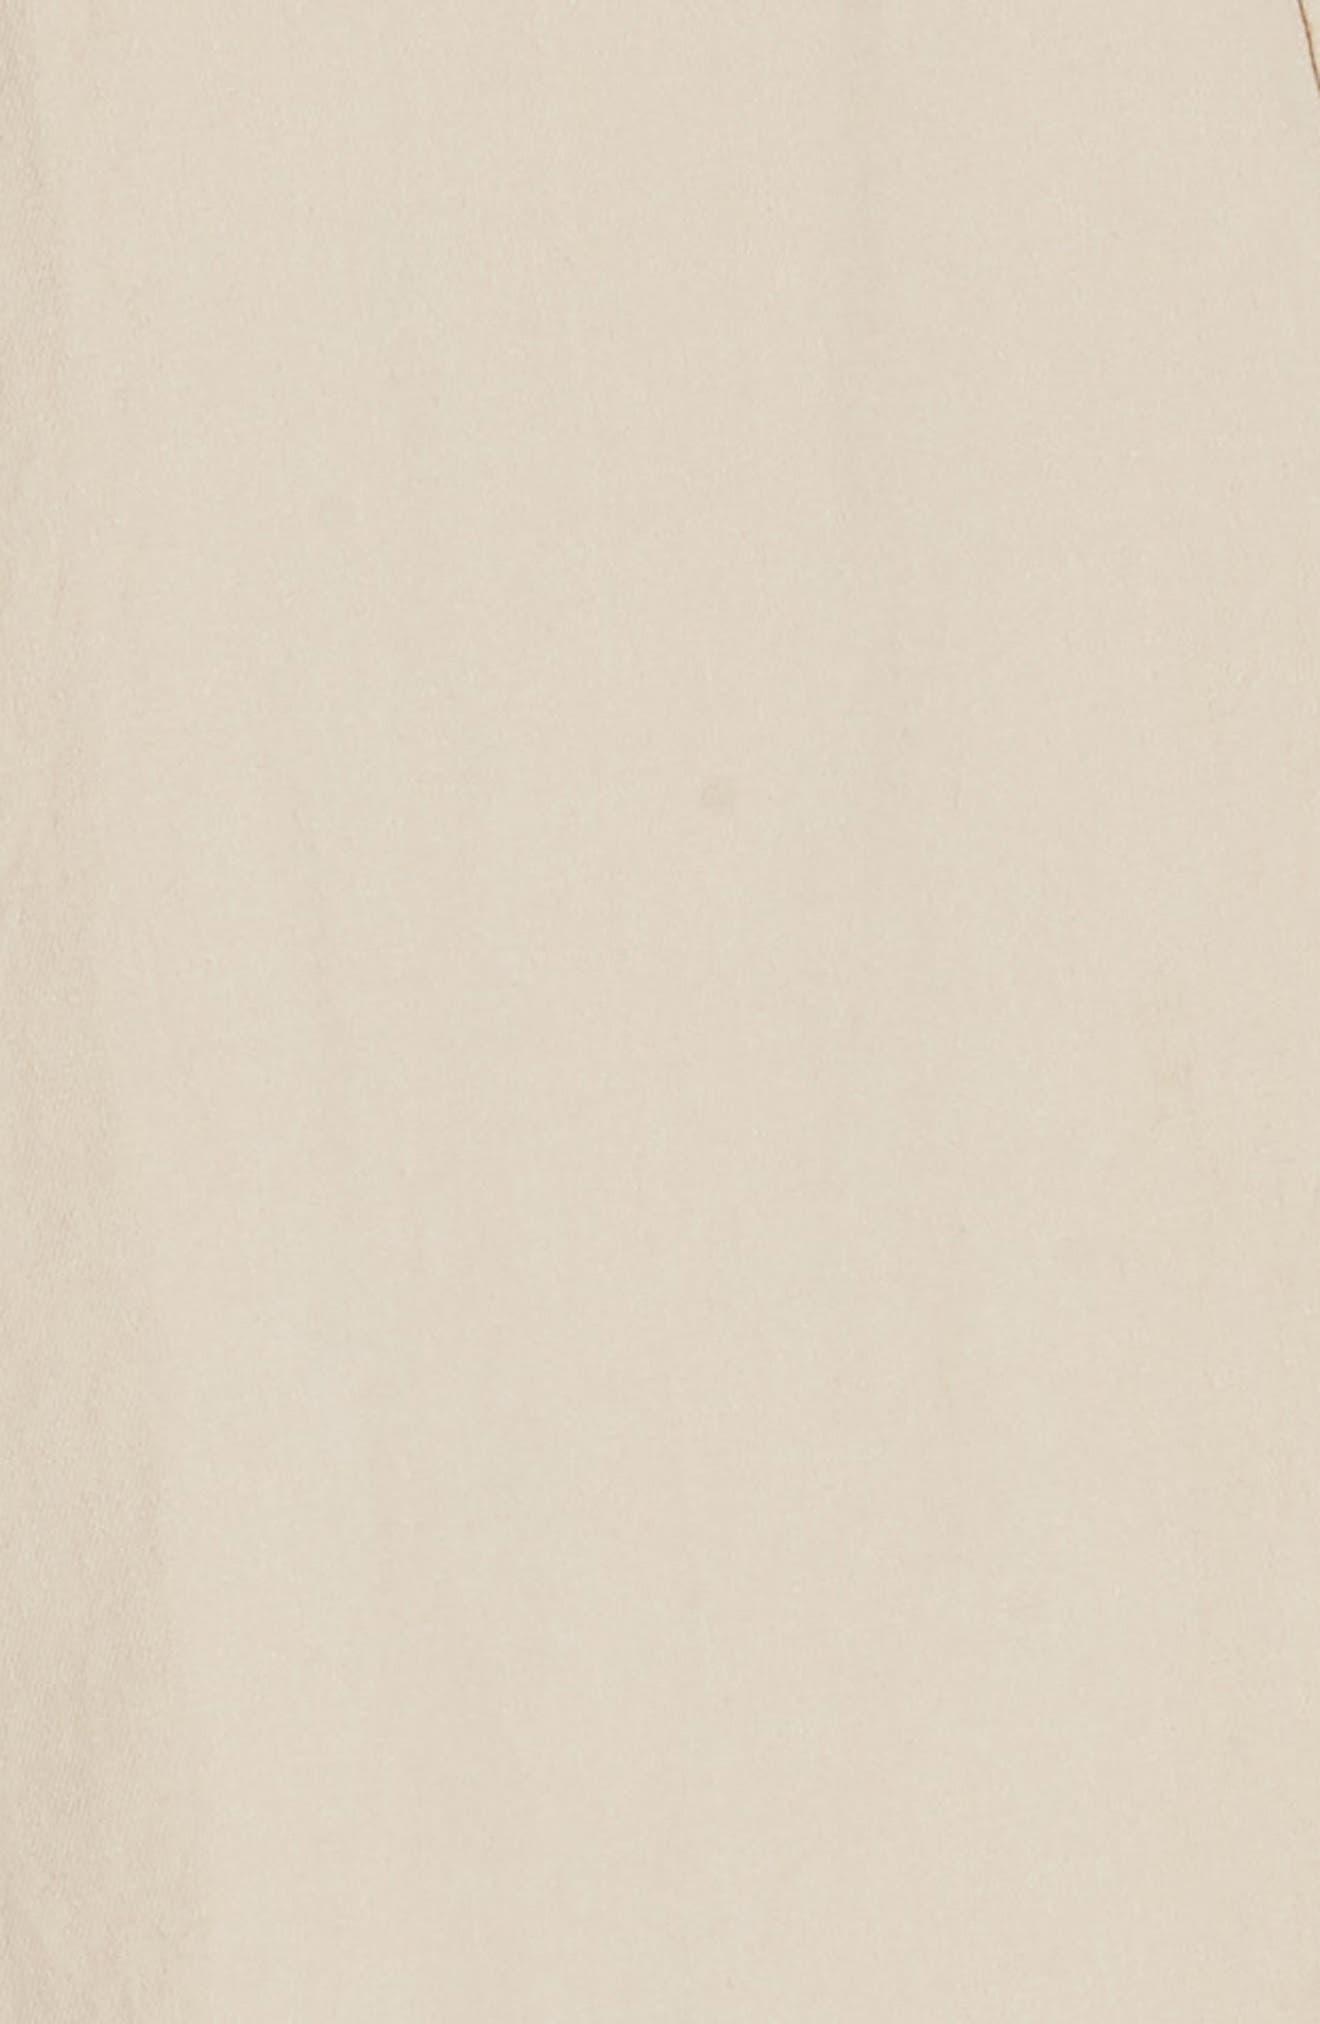 Briel Midi Dress,                             Alternate thumbnail 5, color,                             253